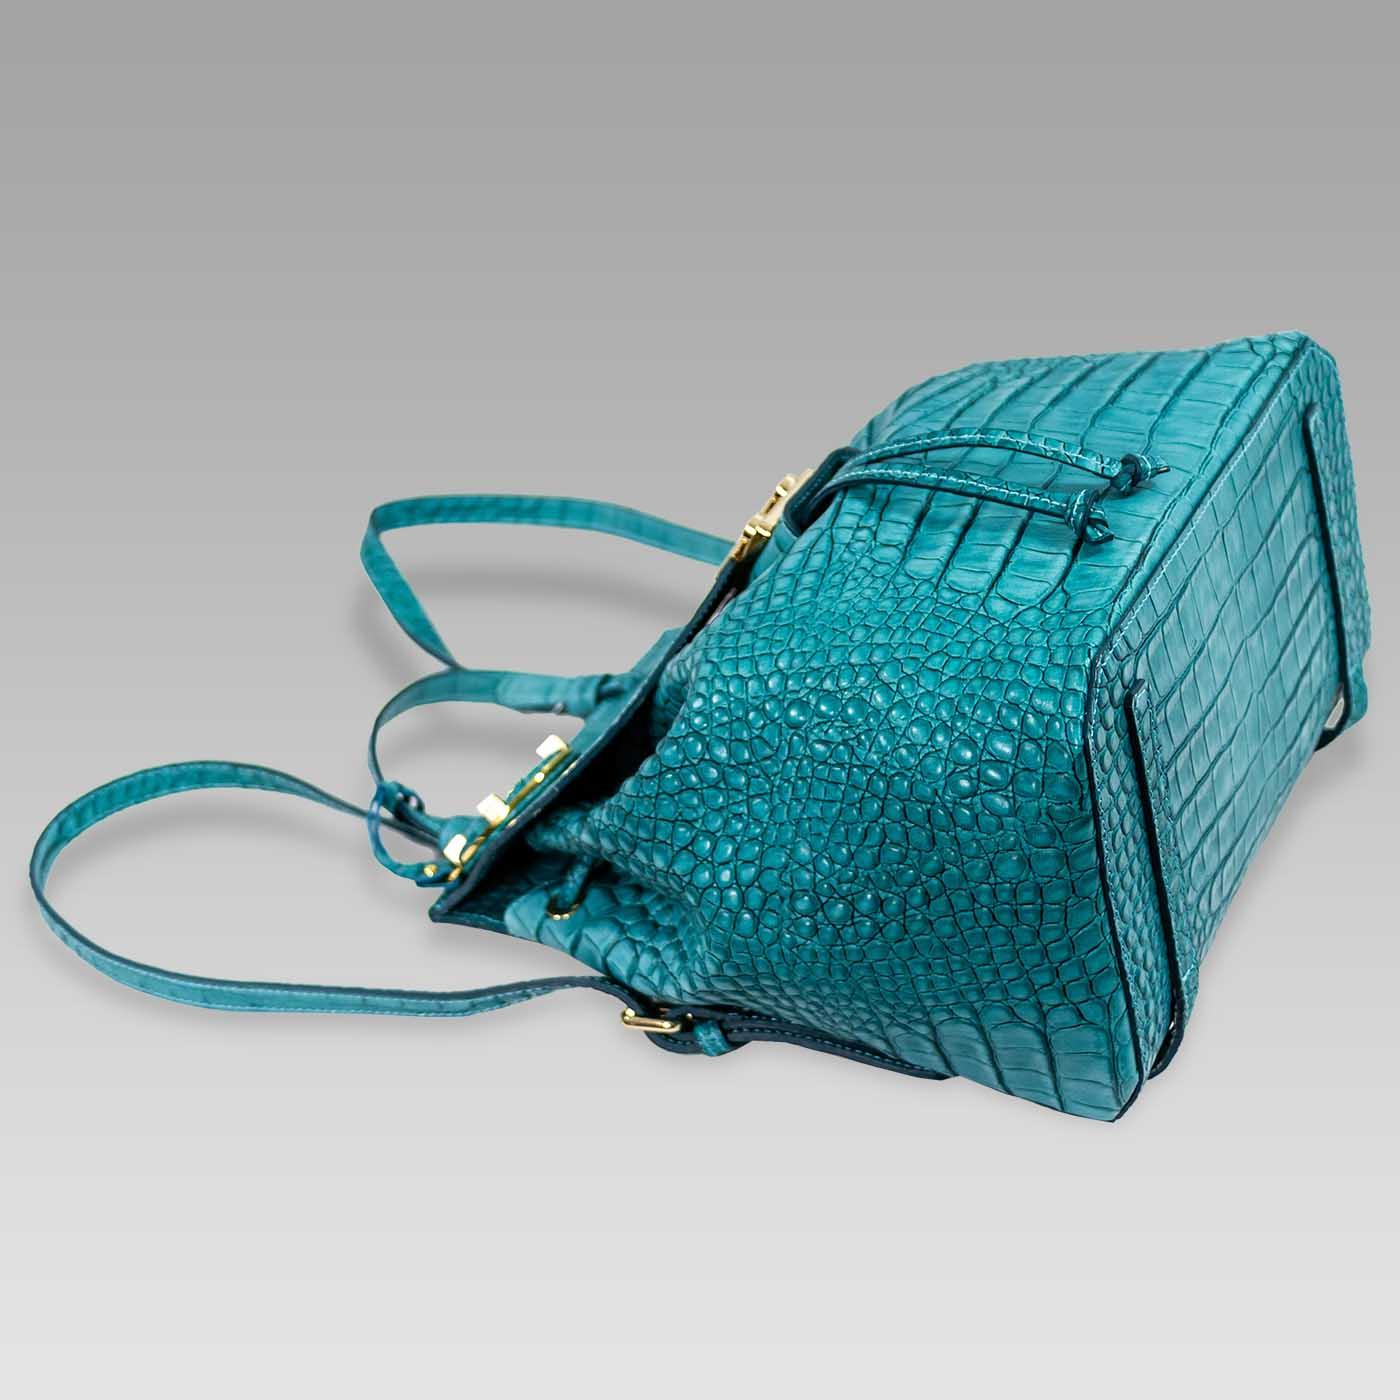 Valentino_Orlandi_Backpack_Deco_Blue_Croc_Embossed_Leather_Bucket_Bag_01VO41989CLAQ_03.jpg